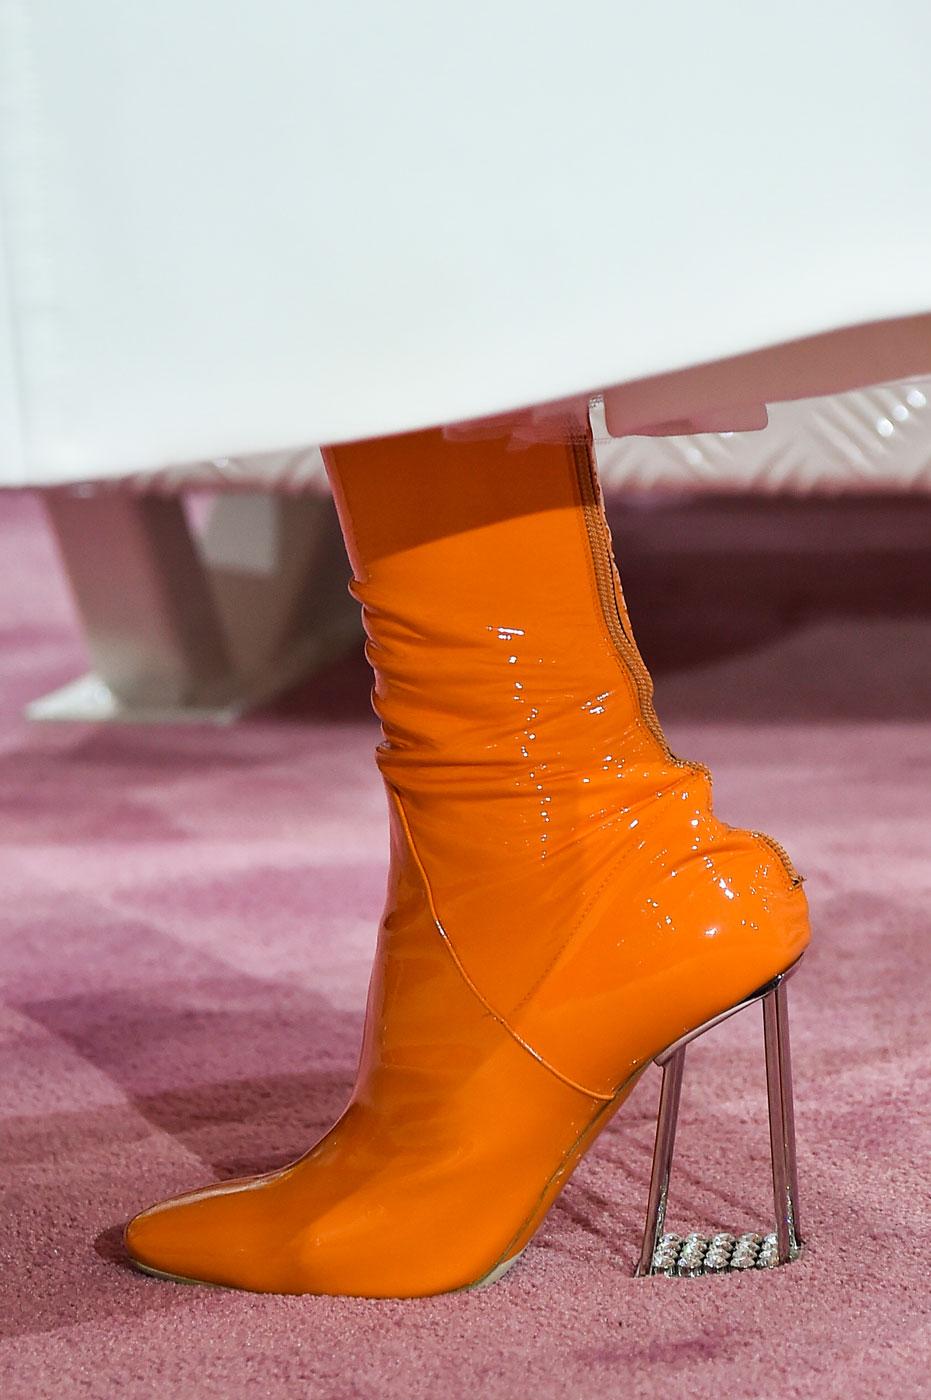 Christian-Dior-fashion-runway-show-close-ups-haute-couture-paris-spring-summer-2015-the-impression-138